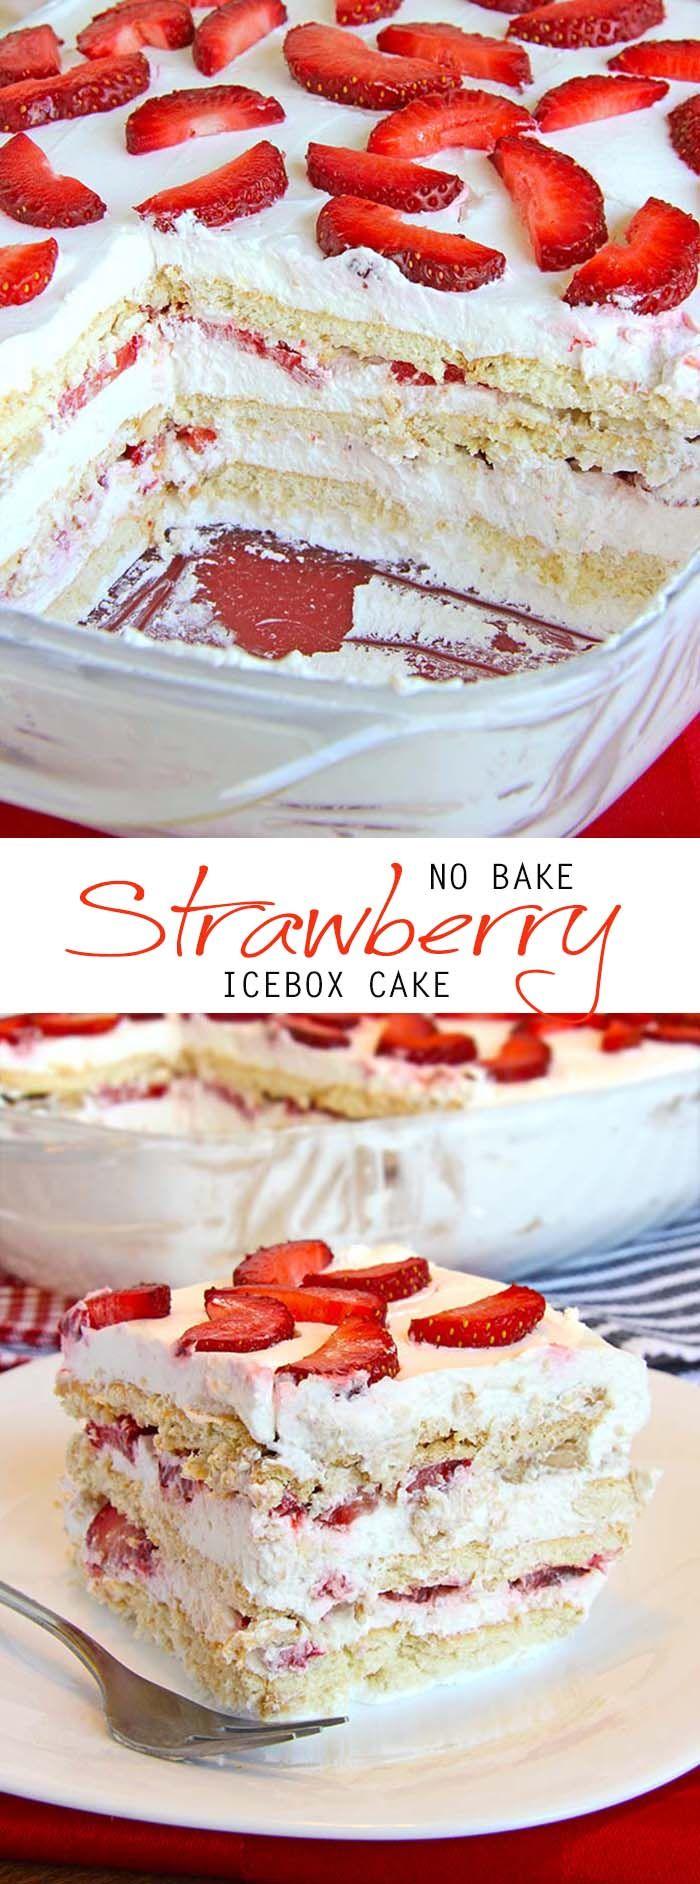 No Bake Strawberry Icebox Cake Cakescottage Recipe Desserts Strawberry Recipes Summer Dessert Recipes